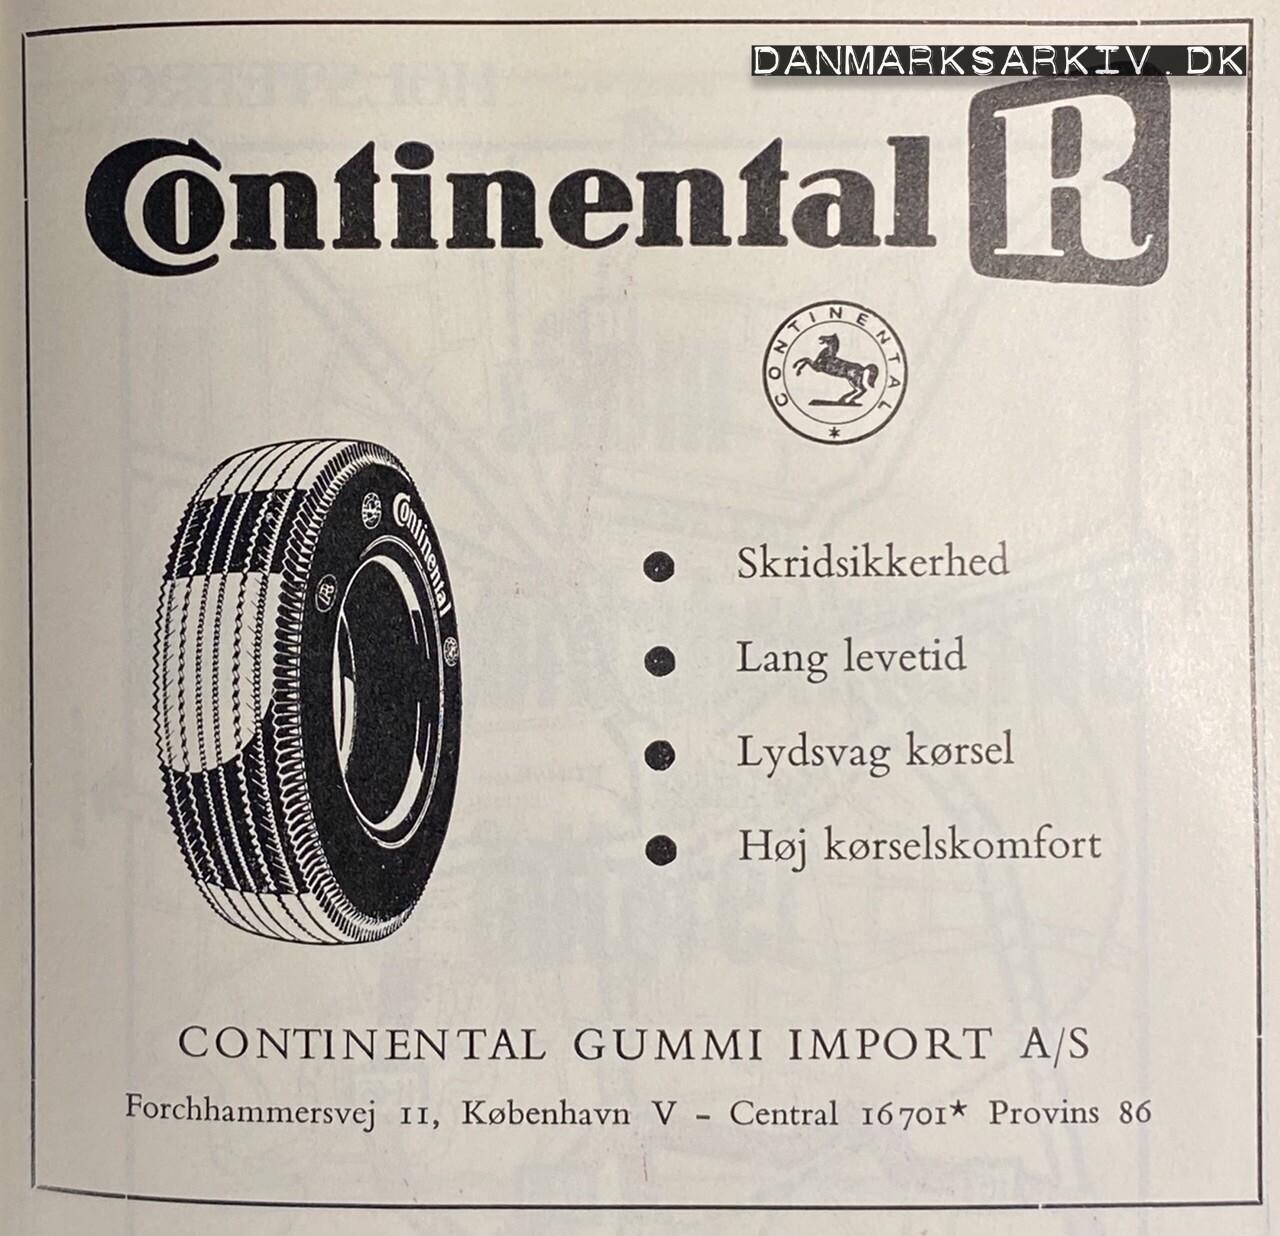 Continental R - Continental Gummi Import A/S - 1960'erne